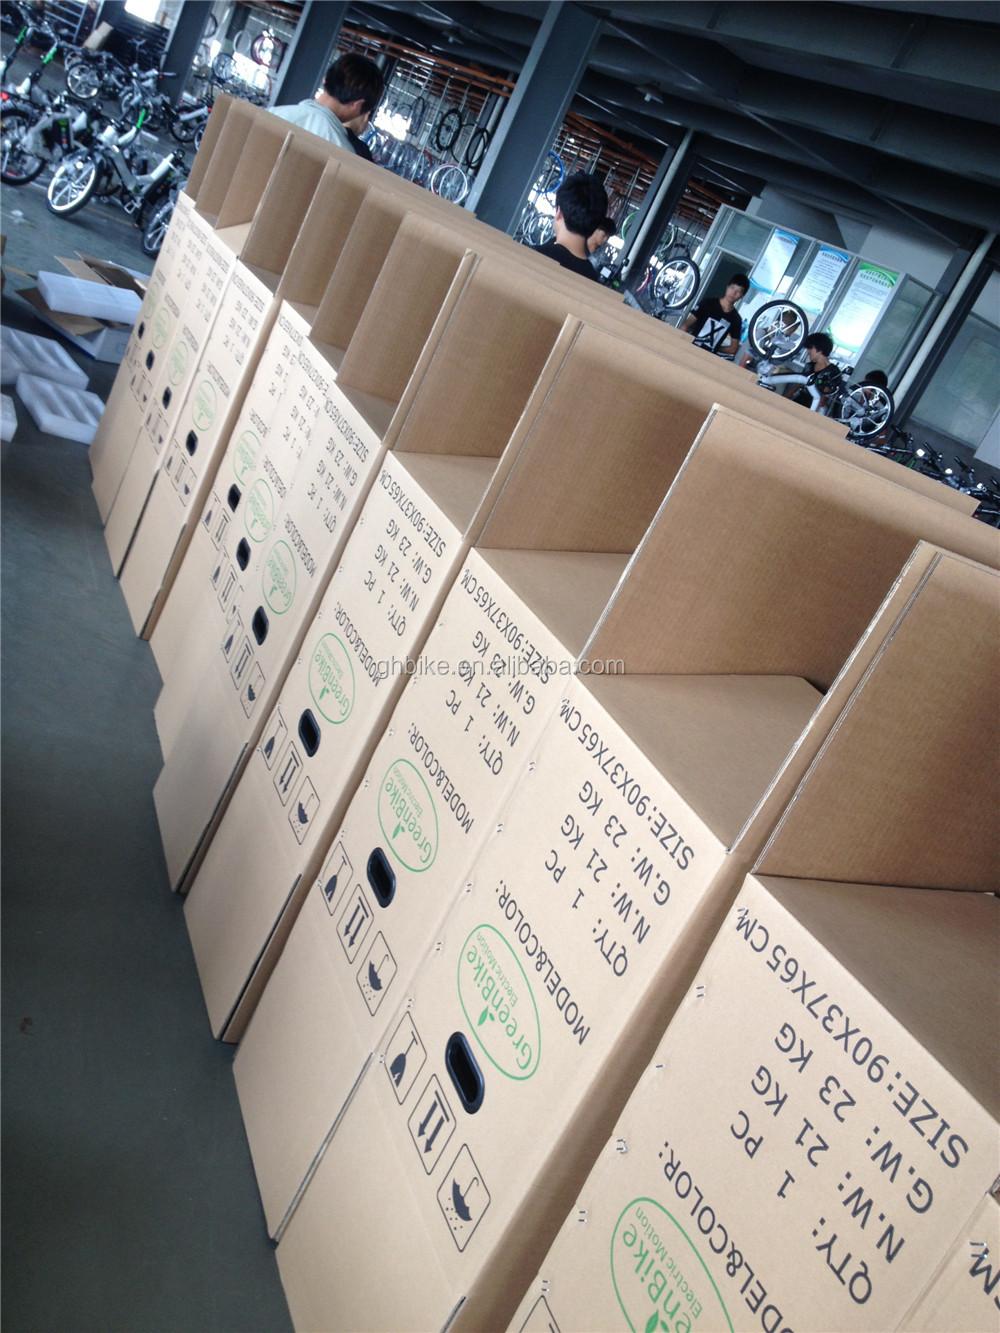 boxes.JPG